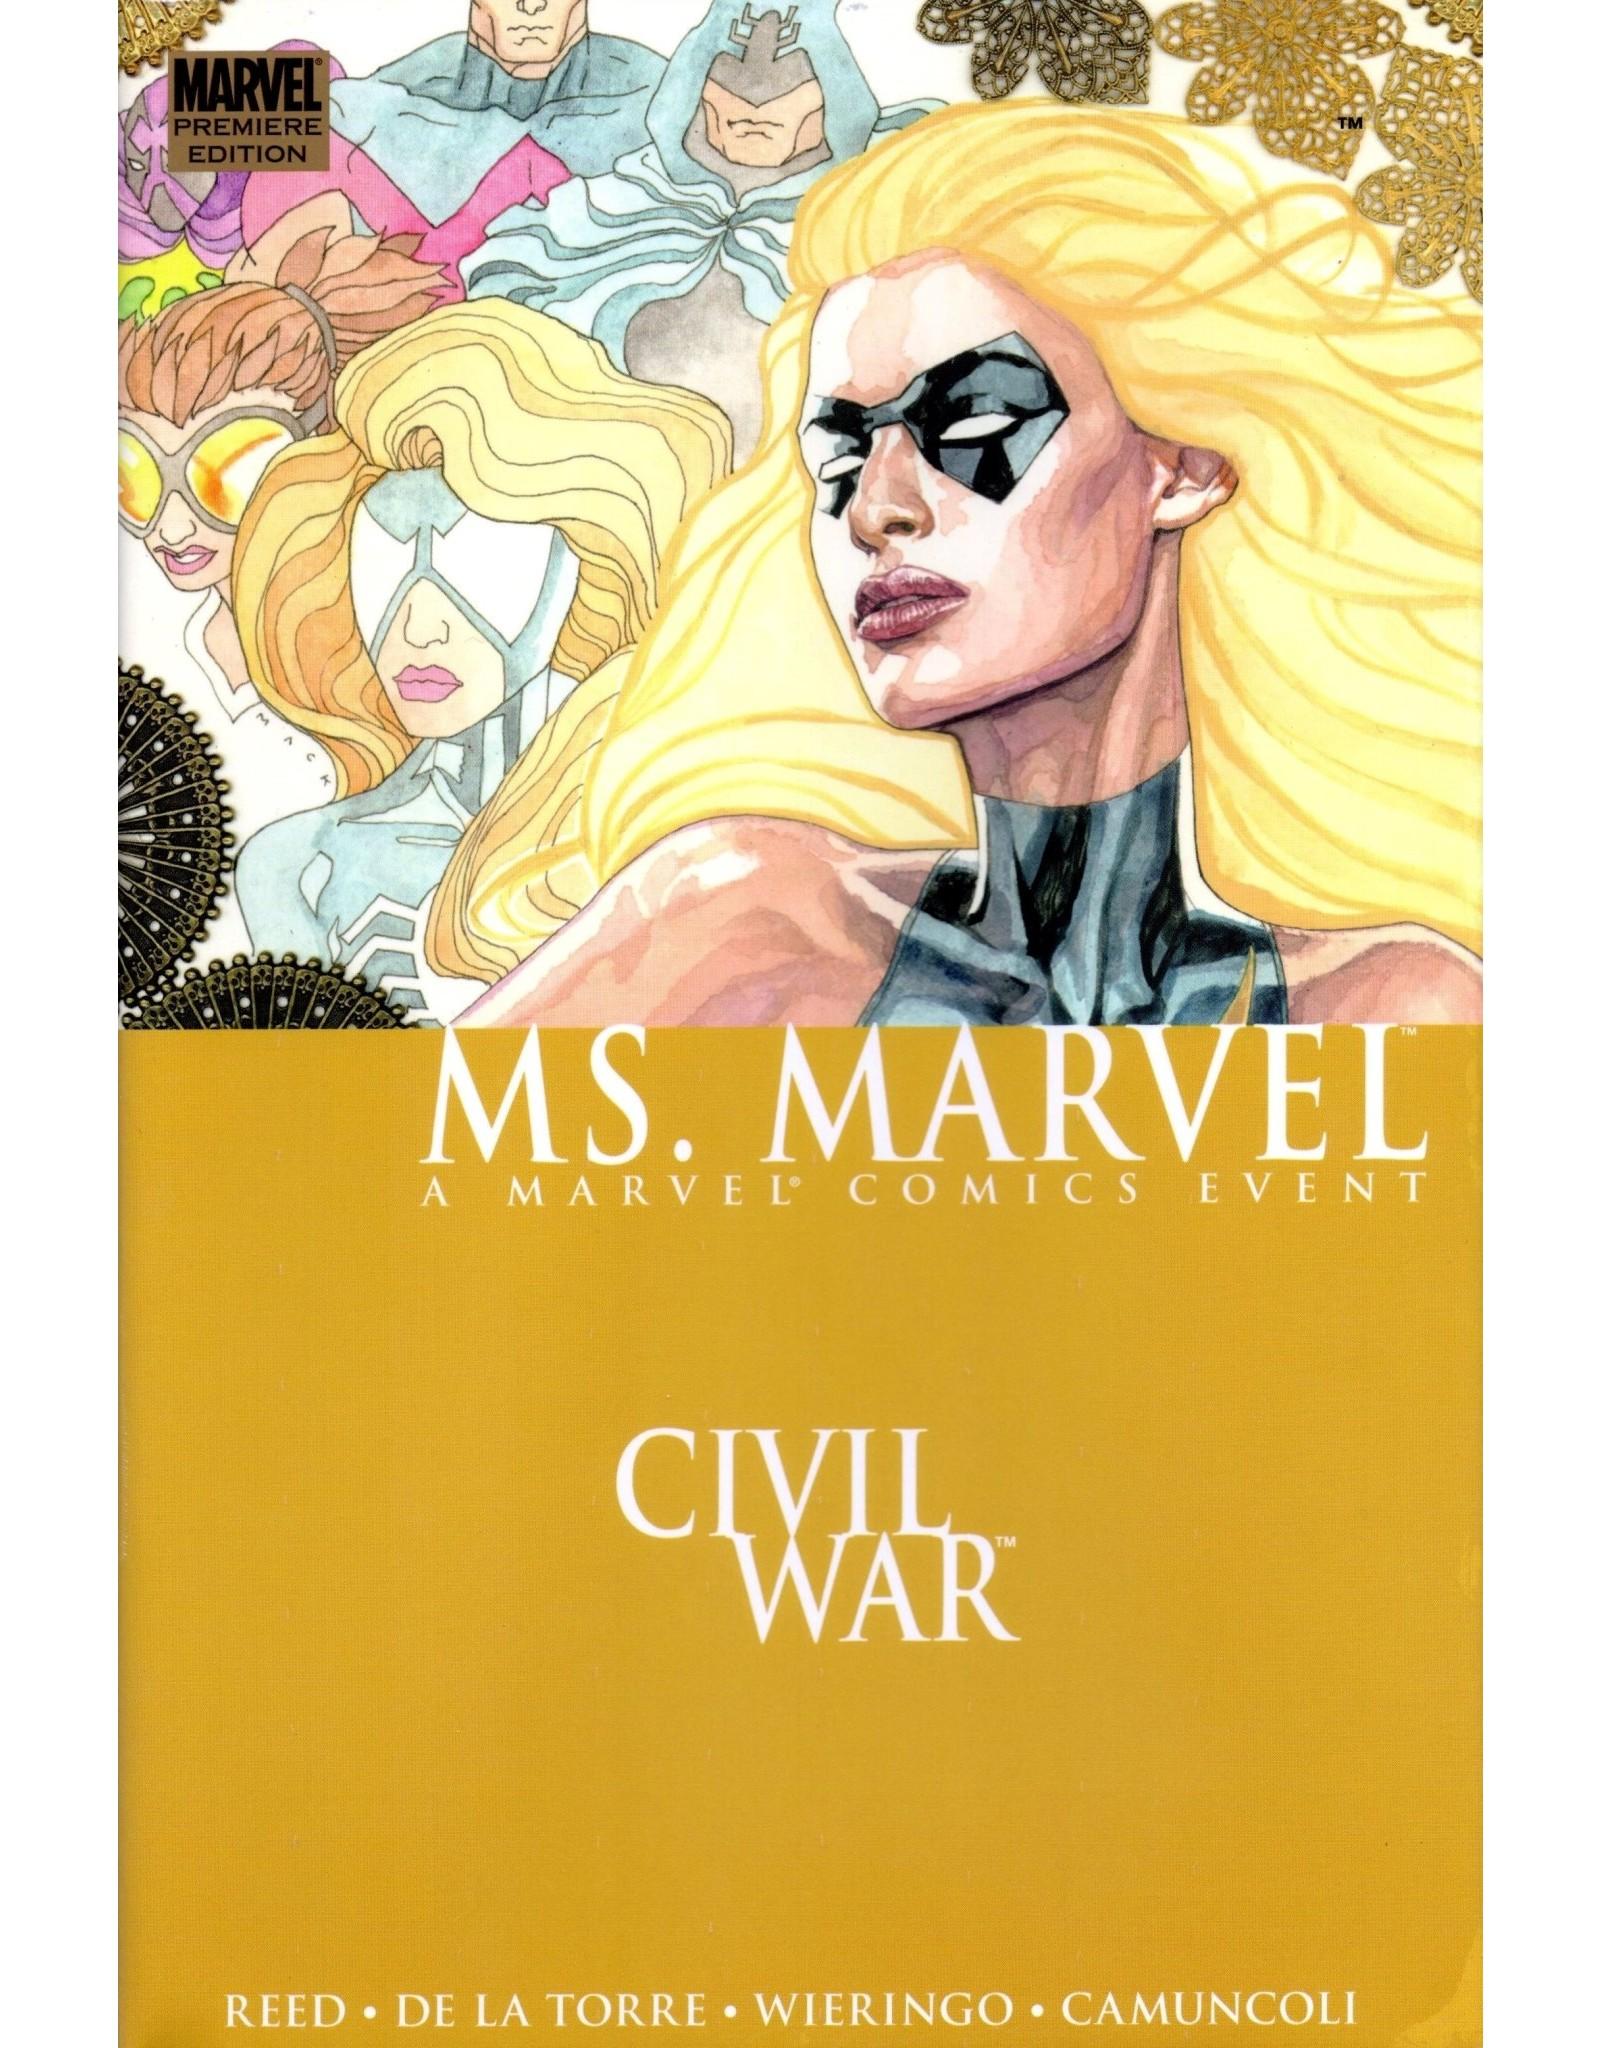 MARVEL COMICS MS MARVEL PREMIERE HC 2 CIVIL WAR